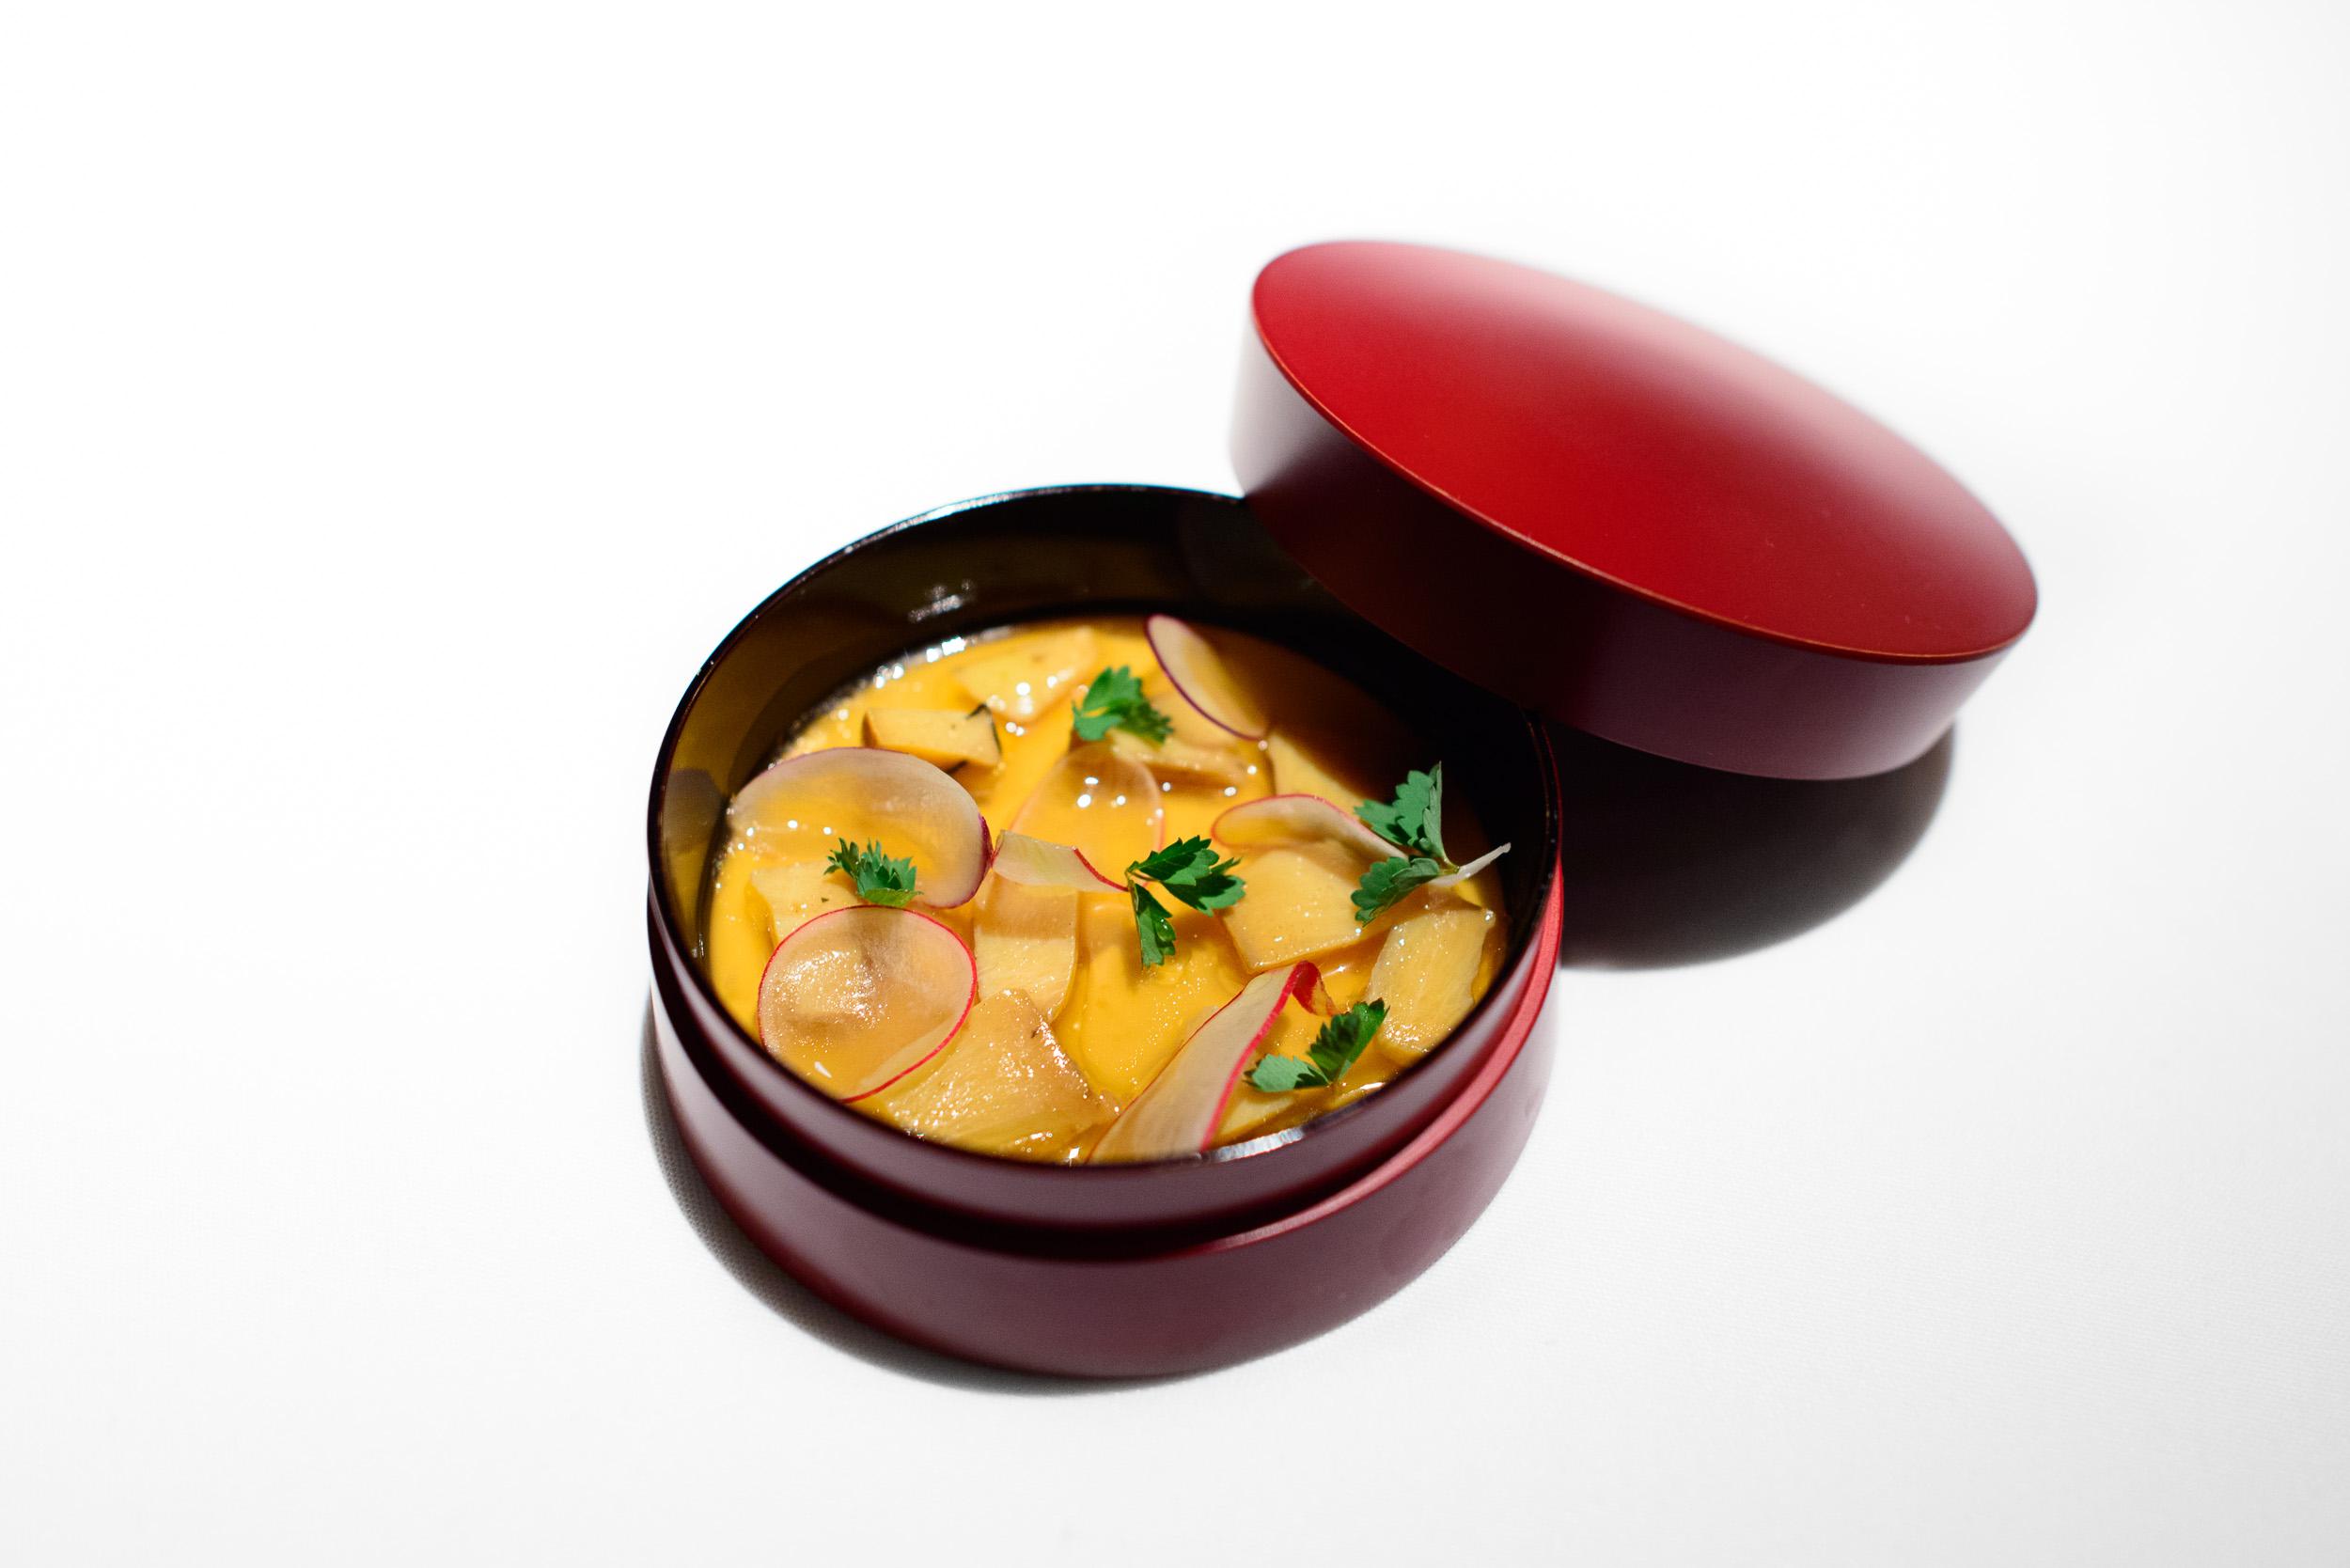 9th Course: Abalone panna cotta